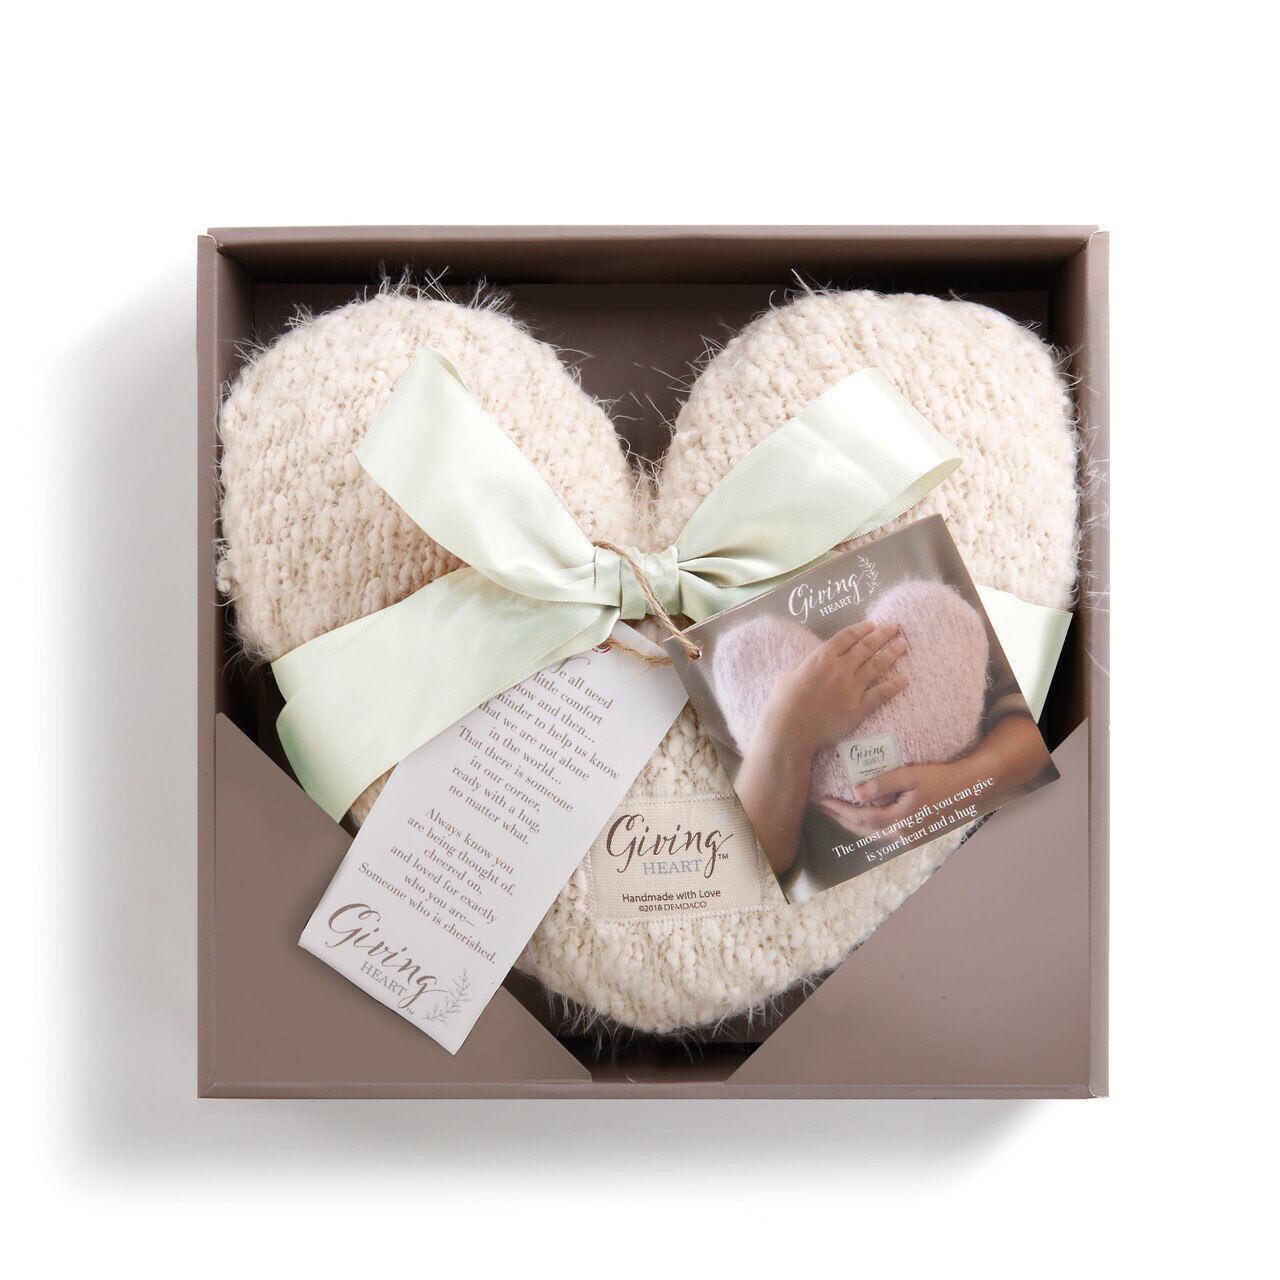 Cream Giving Heart Pillow by Demdaco